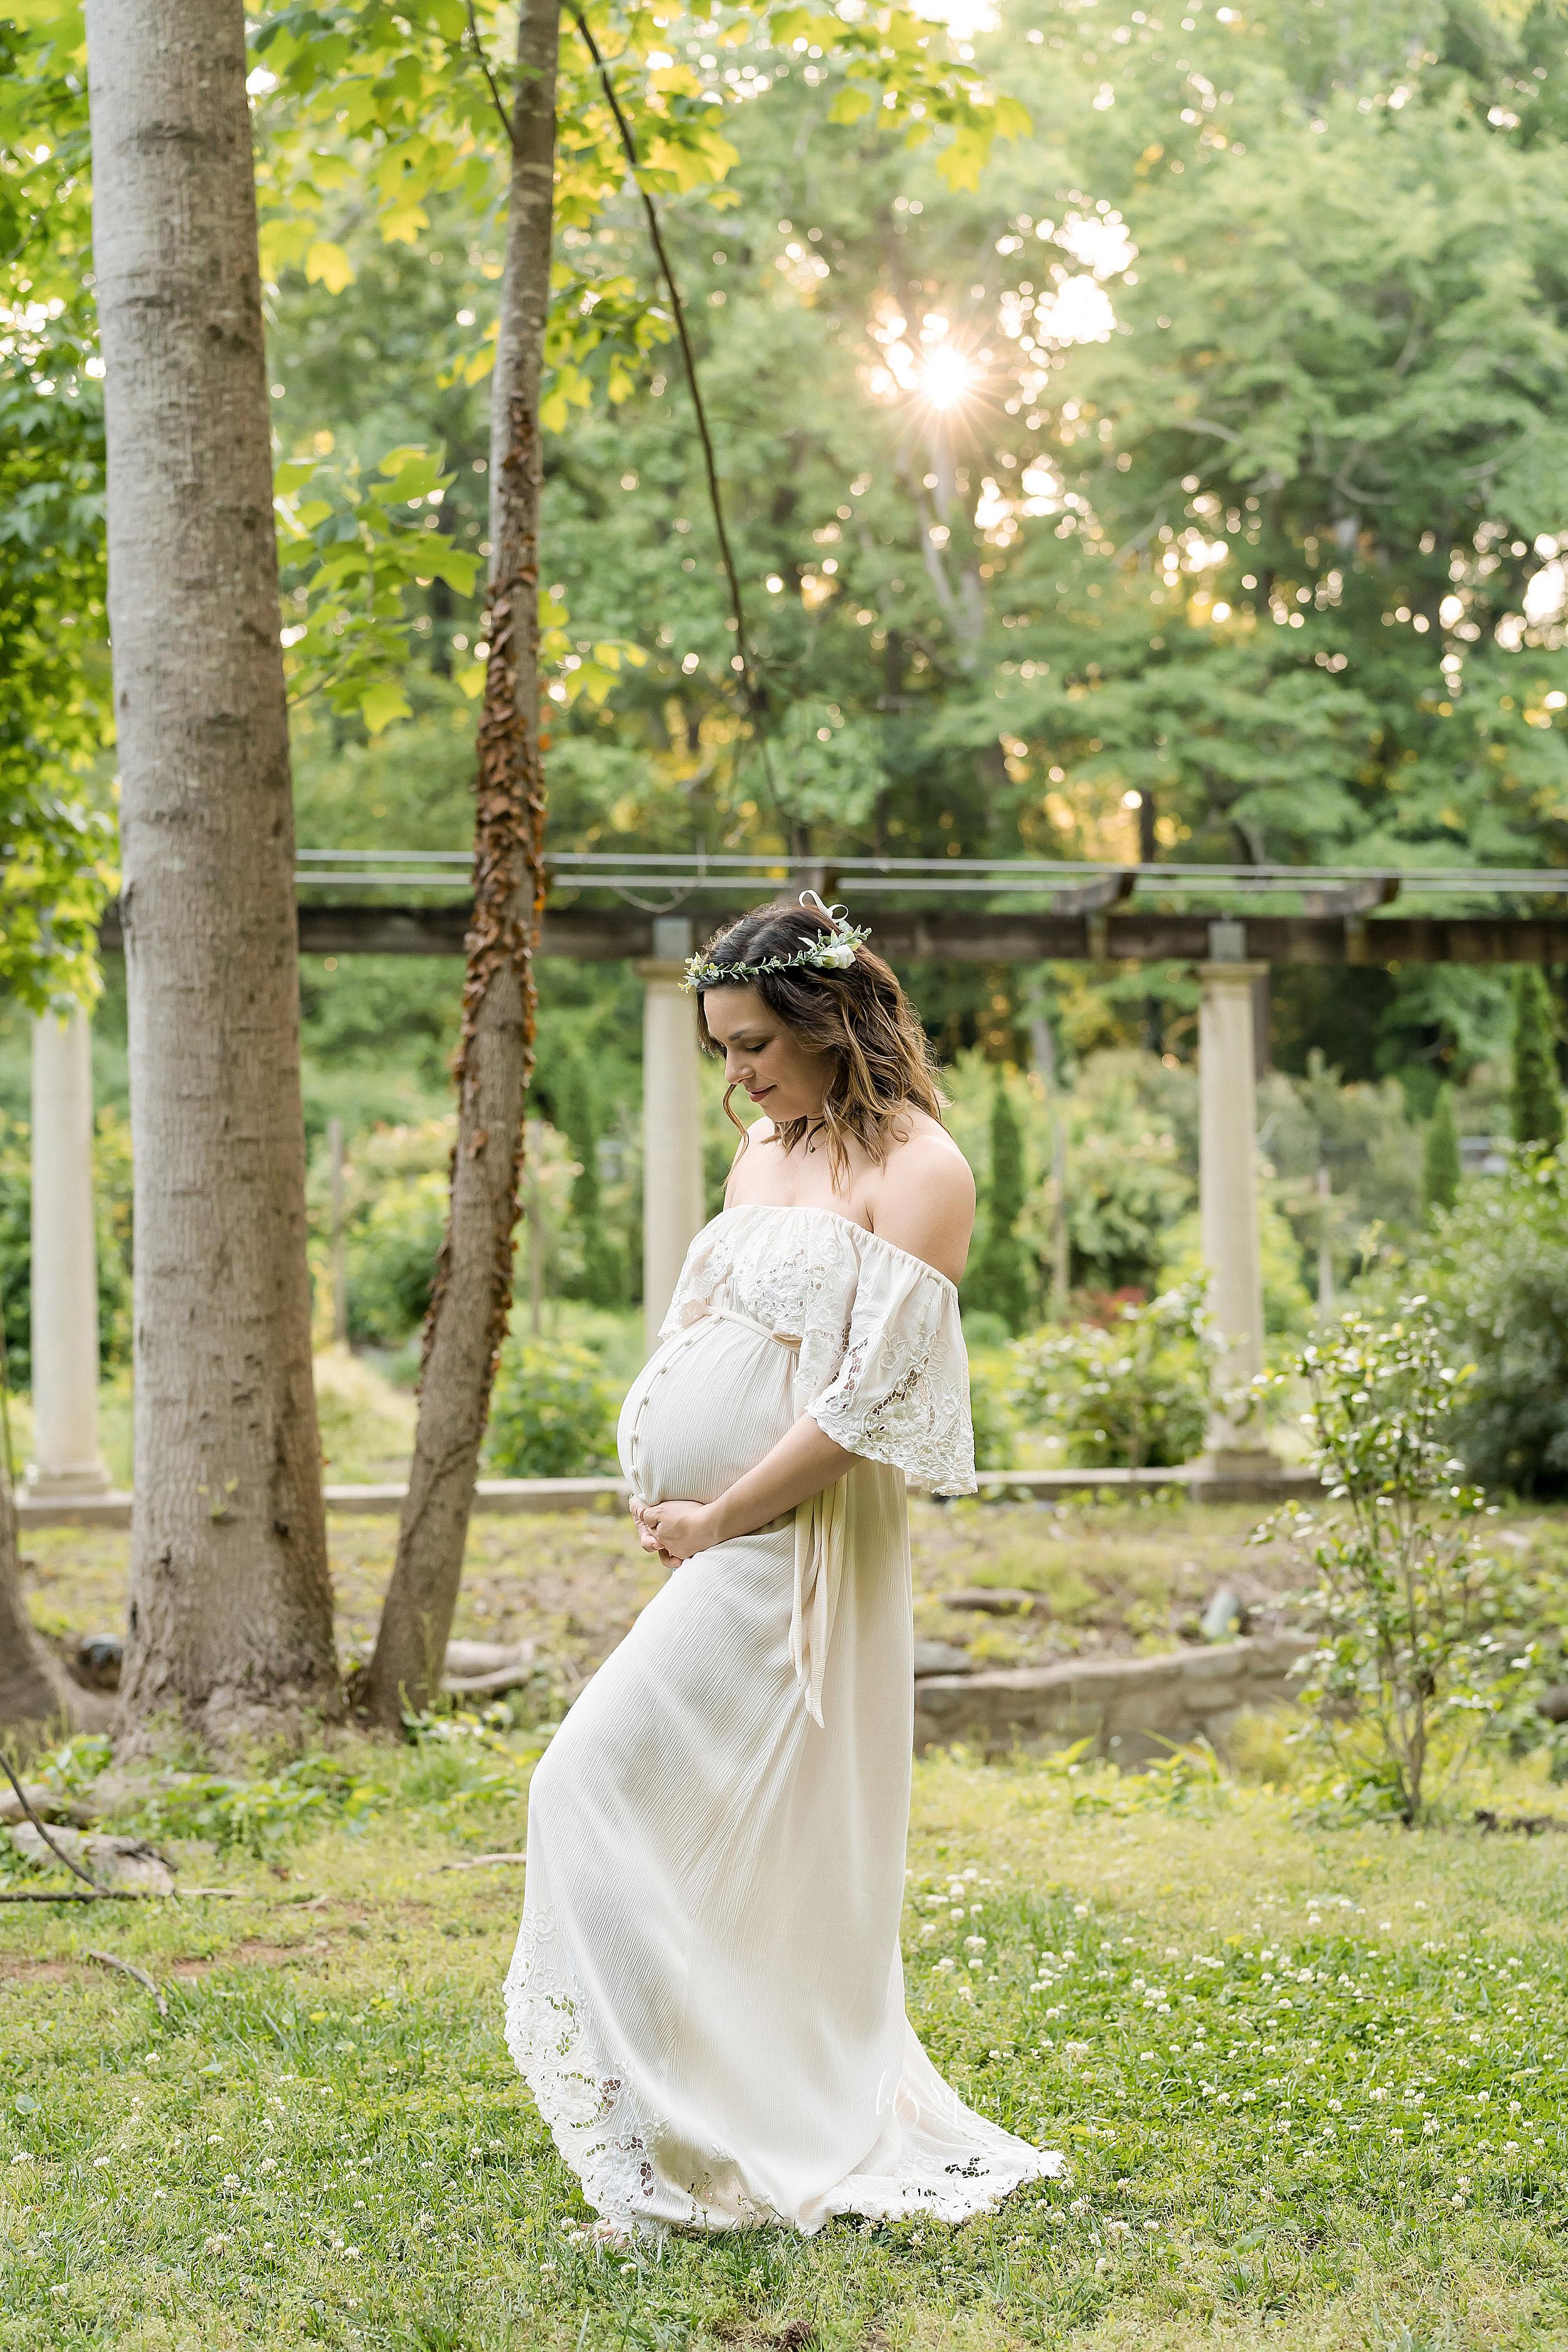 atlanta-decatur-acworth-candler-park-sandy-springs-buckhead-virginia-highlands-west-end-decatur-lily-sophia-photography-gardens-maternity-couples-family-photos-toddler-girl-expecting-newborn-baby-girl-sister_1700.jpg